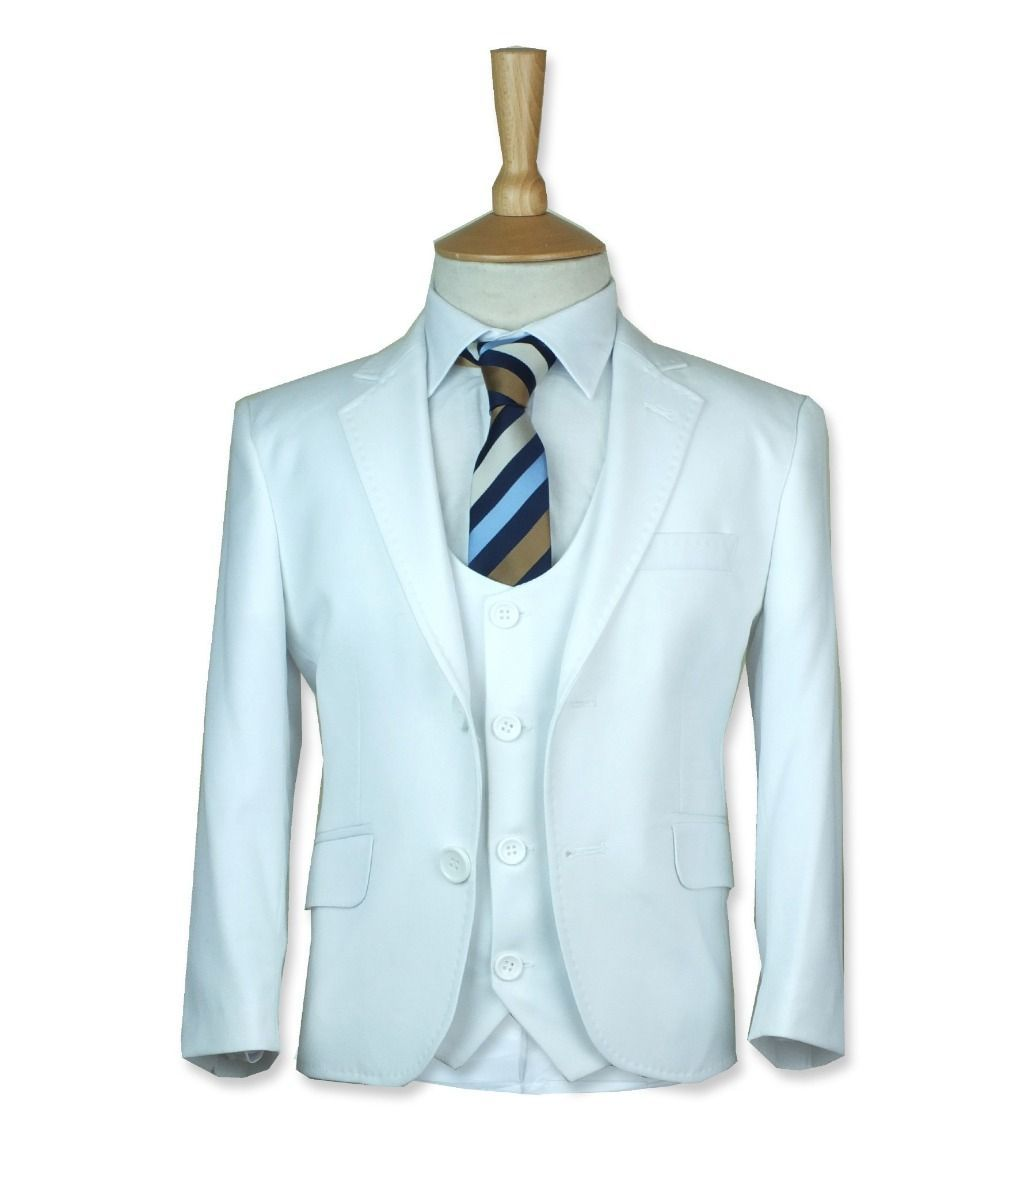 Boys White Communion Suit Designer Page Boy Wedding Slim Fit Suit in White